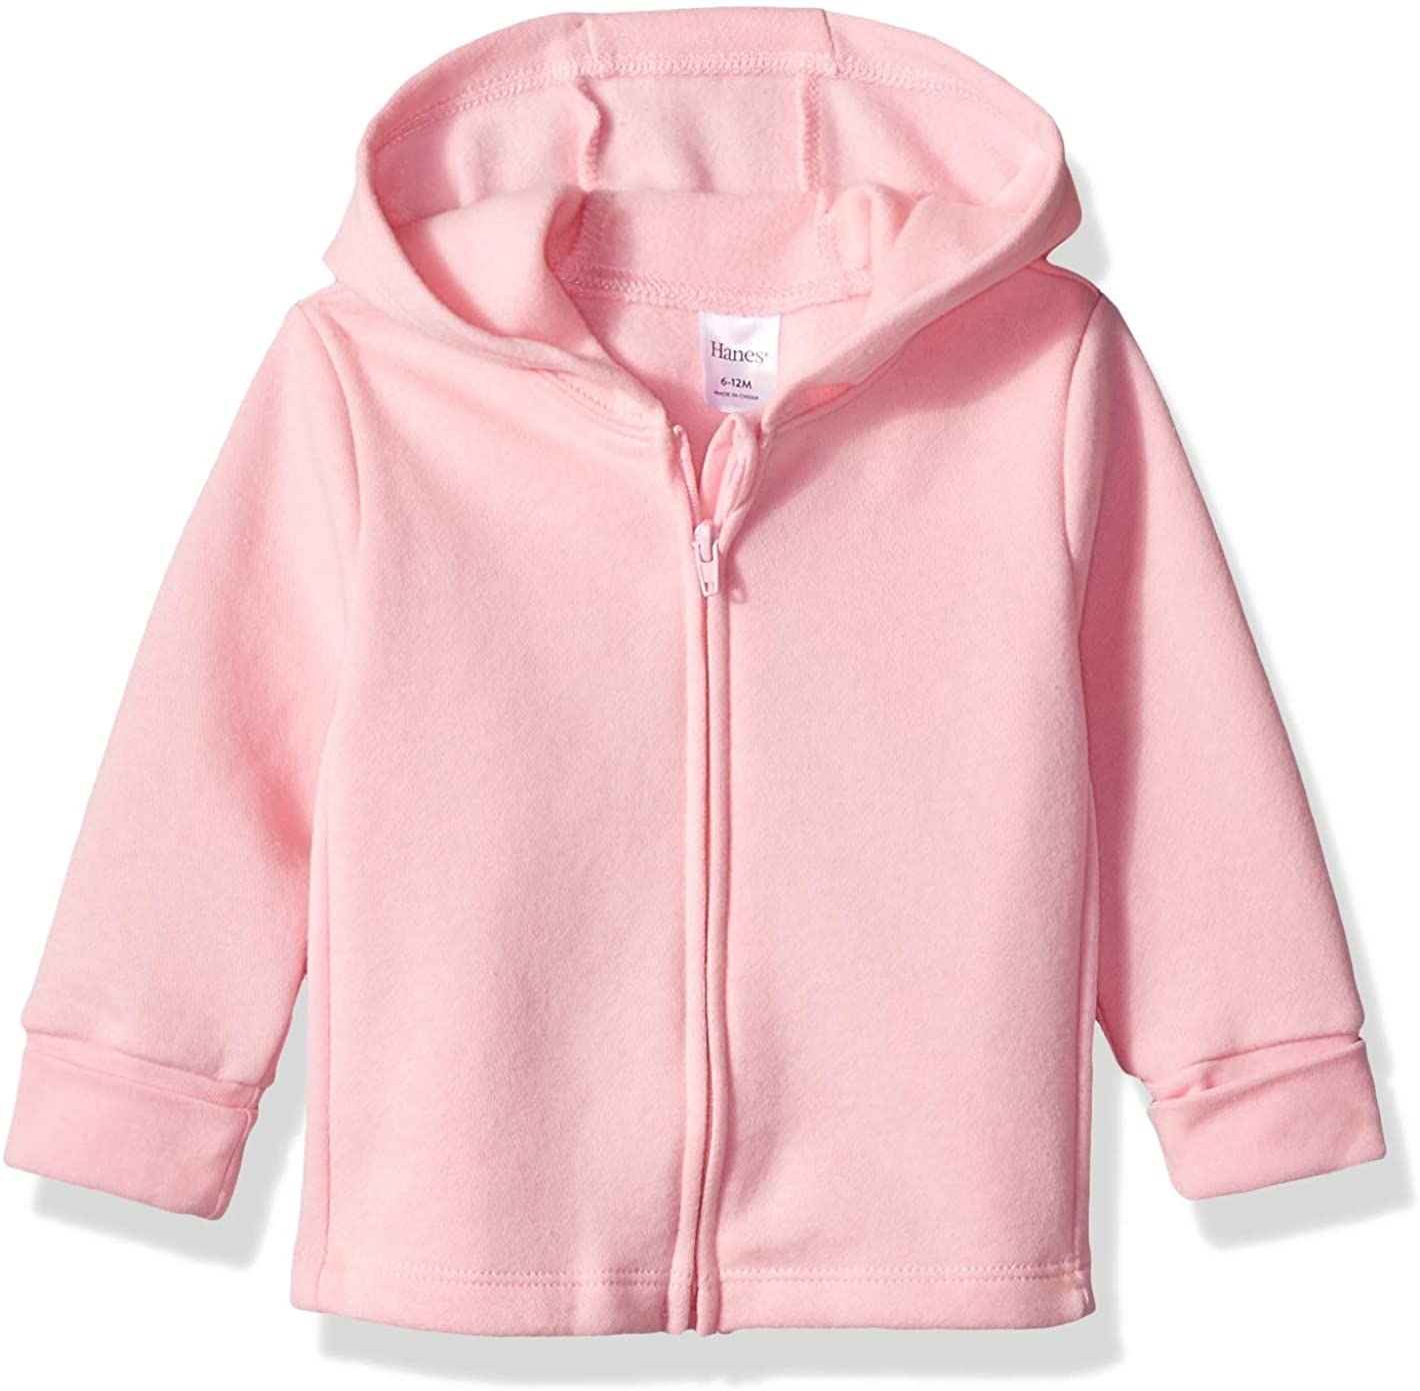 Hanes Ultimate Baby Zippin Fleece Hoodie